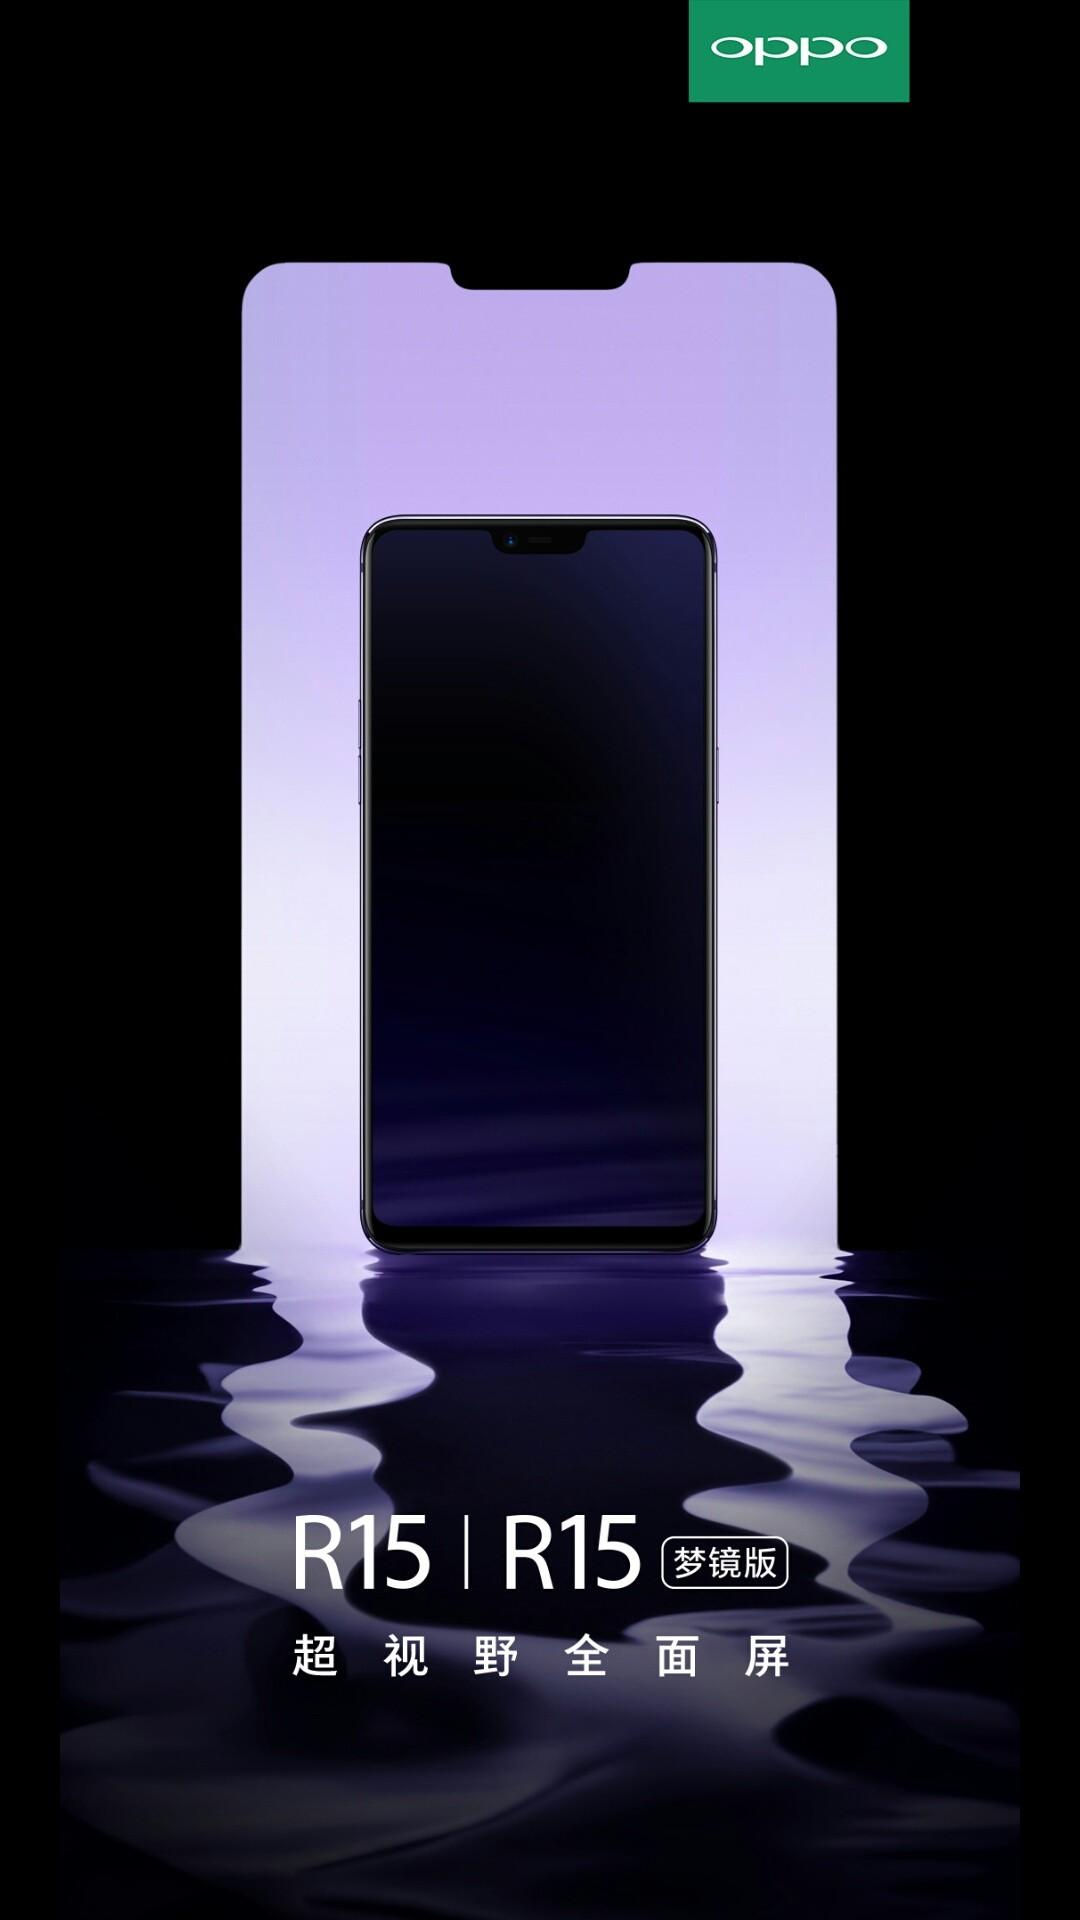 Oppo R15 и R15 Plus получат узнаваемый дизайн1